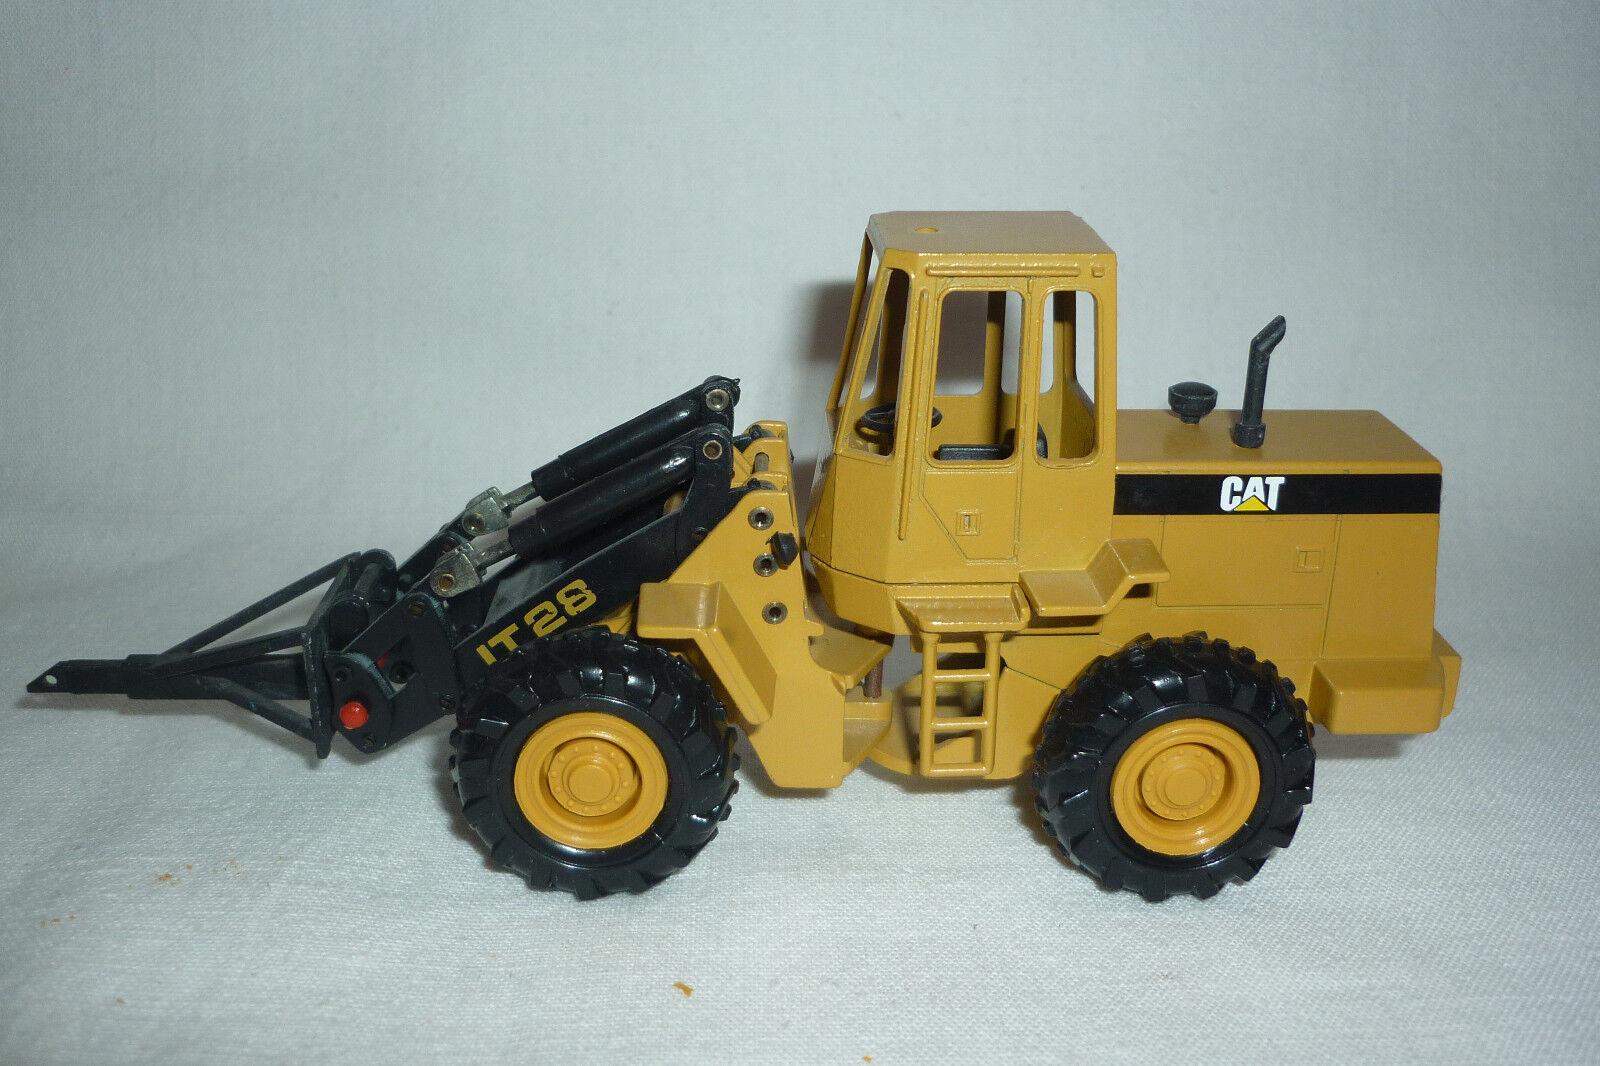 Conrad - Metal Model - Caterpillar Cat It 28 - Radlader - 1 50 - (7.BM-131)